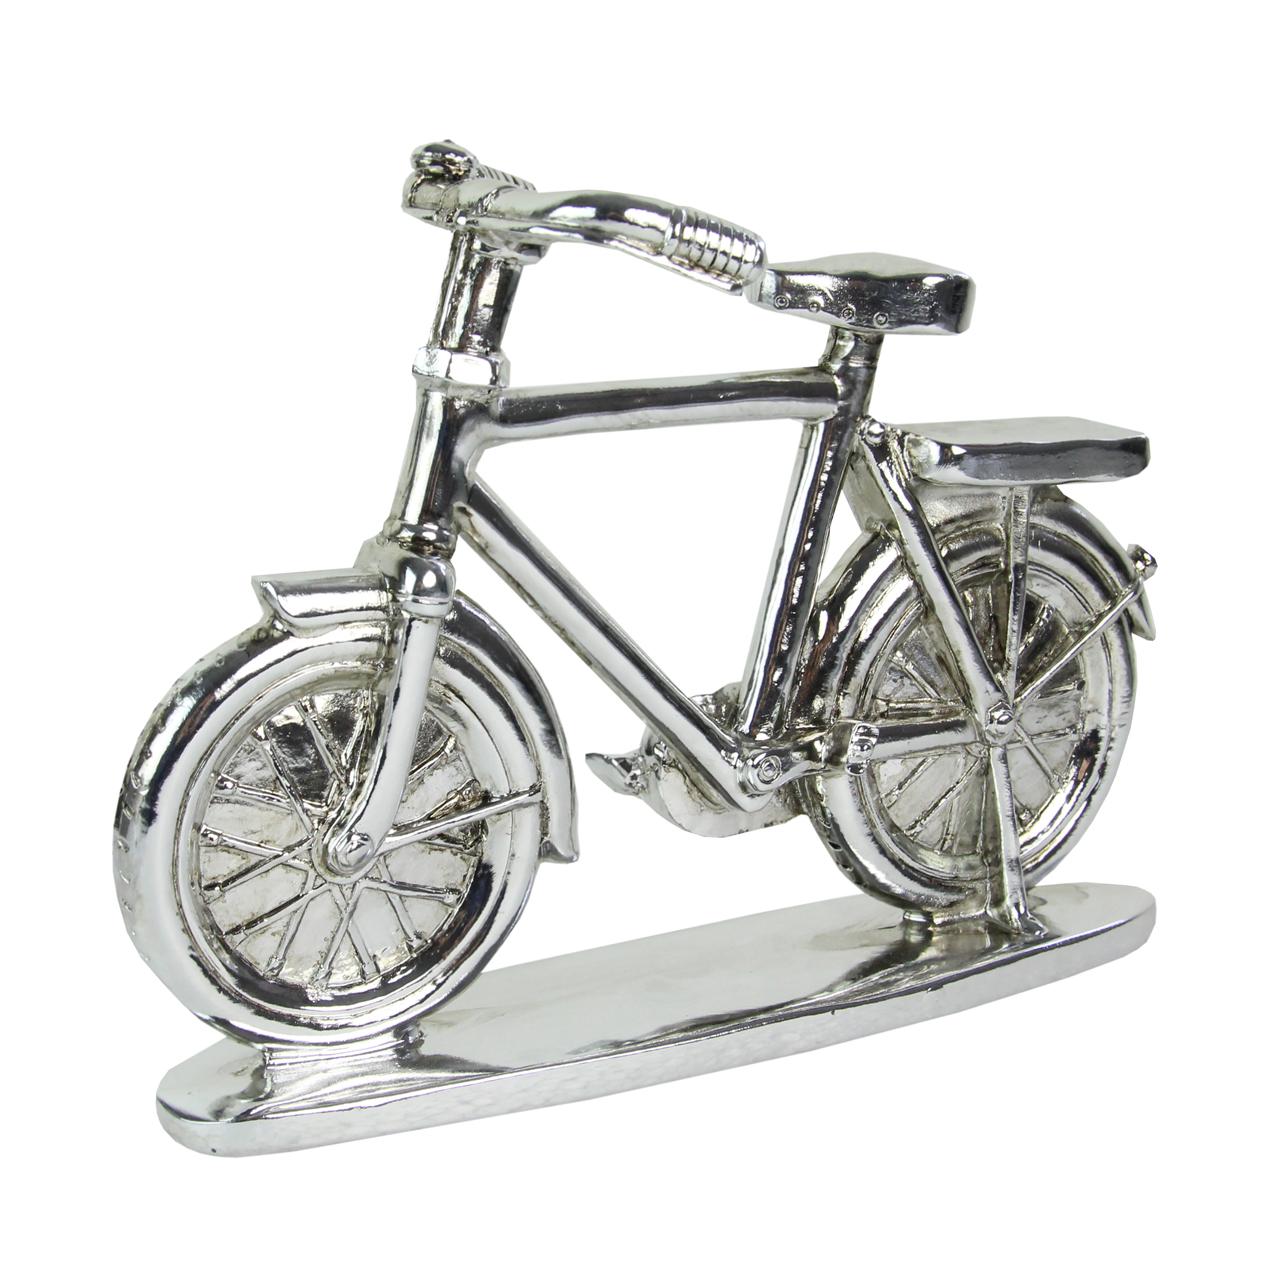 Macheta Bicicleta Argintie 20 Cm